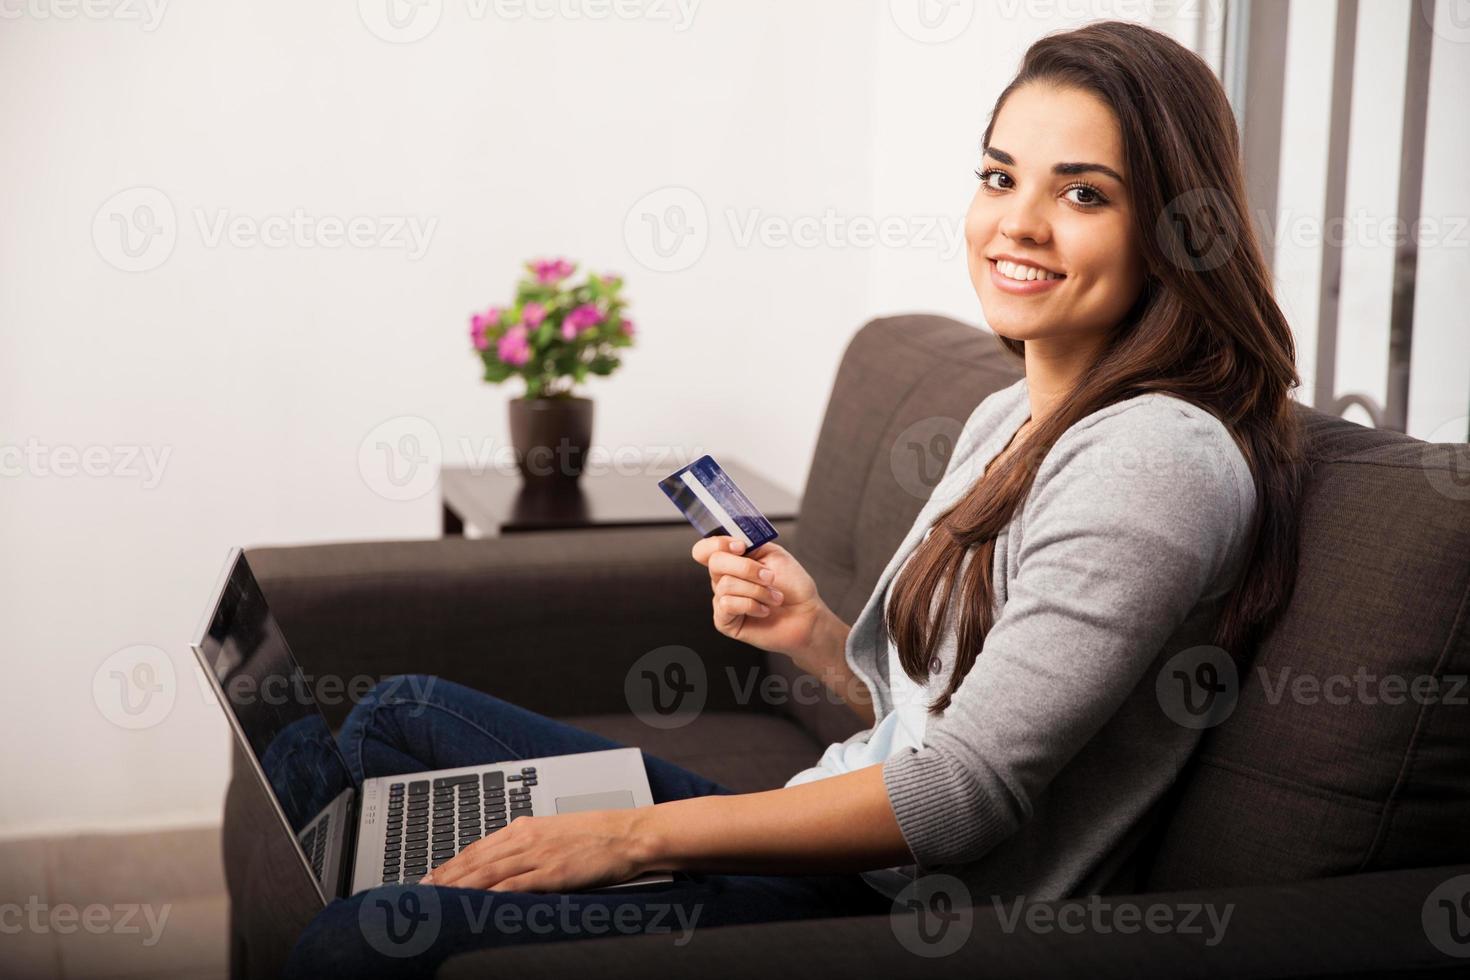 Cute girl shopping online photo